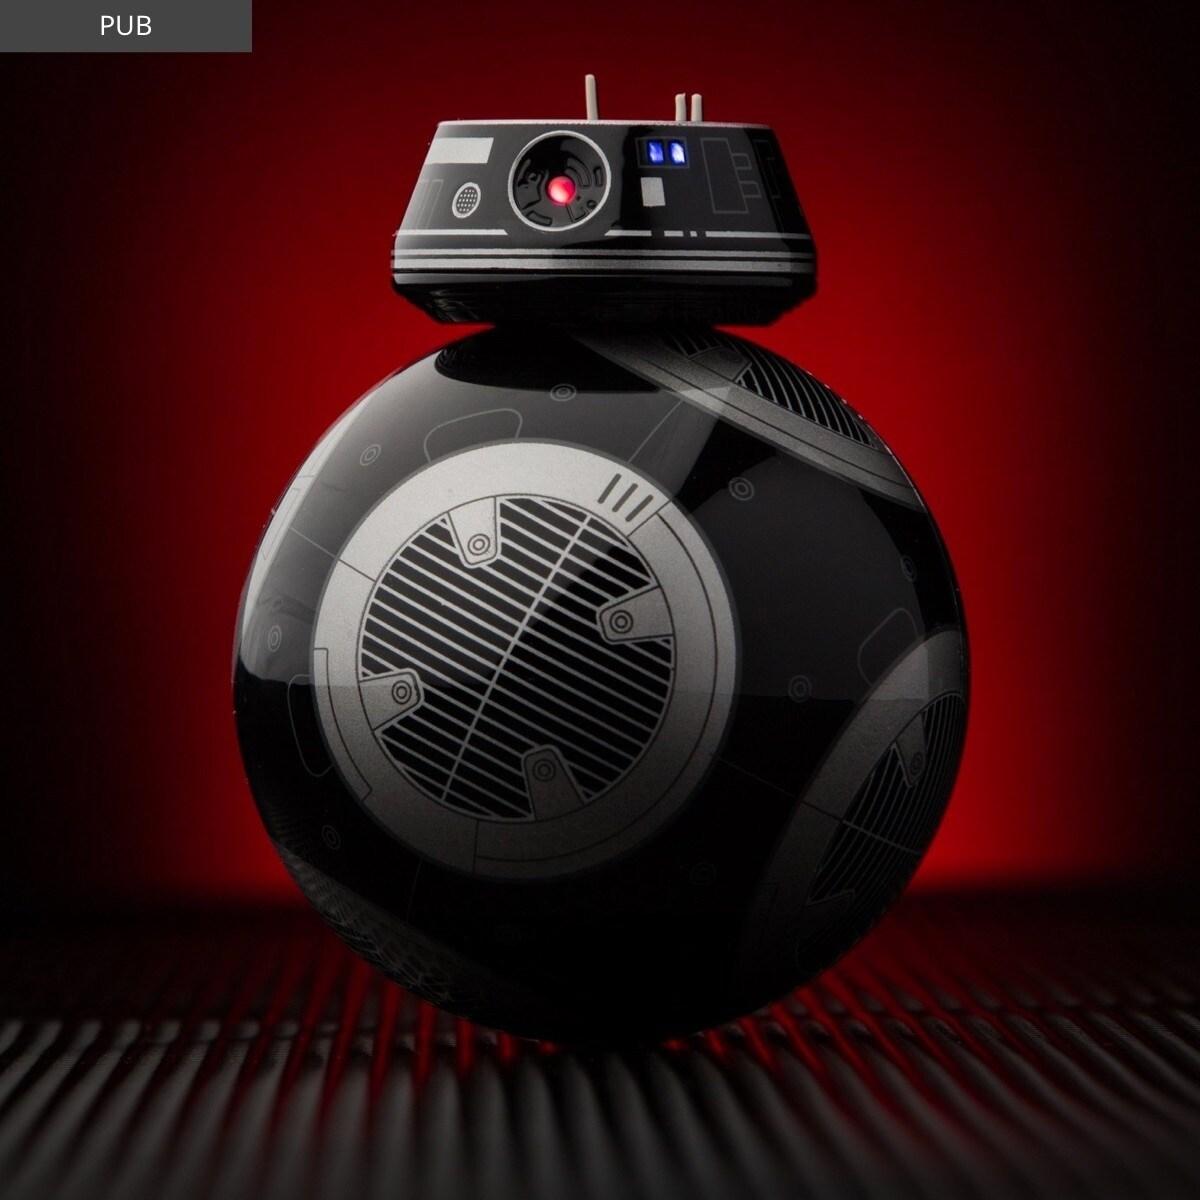 IT - Star Wars The Last Jedi - Featured Product - BB9E Sphero - Flex Grid Object - Square